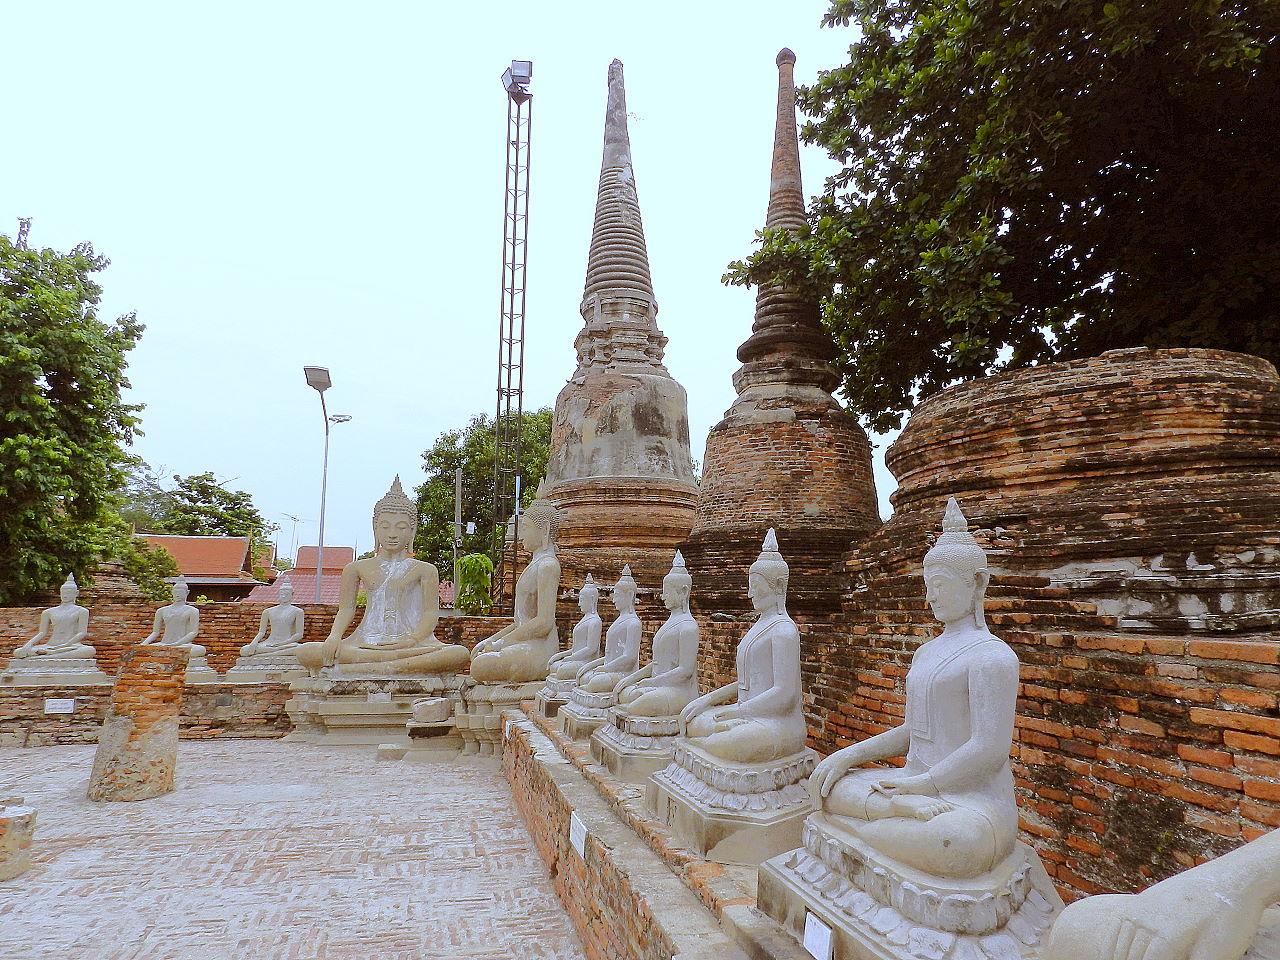 Thailand Bilder - Wat Yai Chai Mongkhon in Ayutthaya